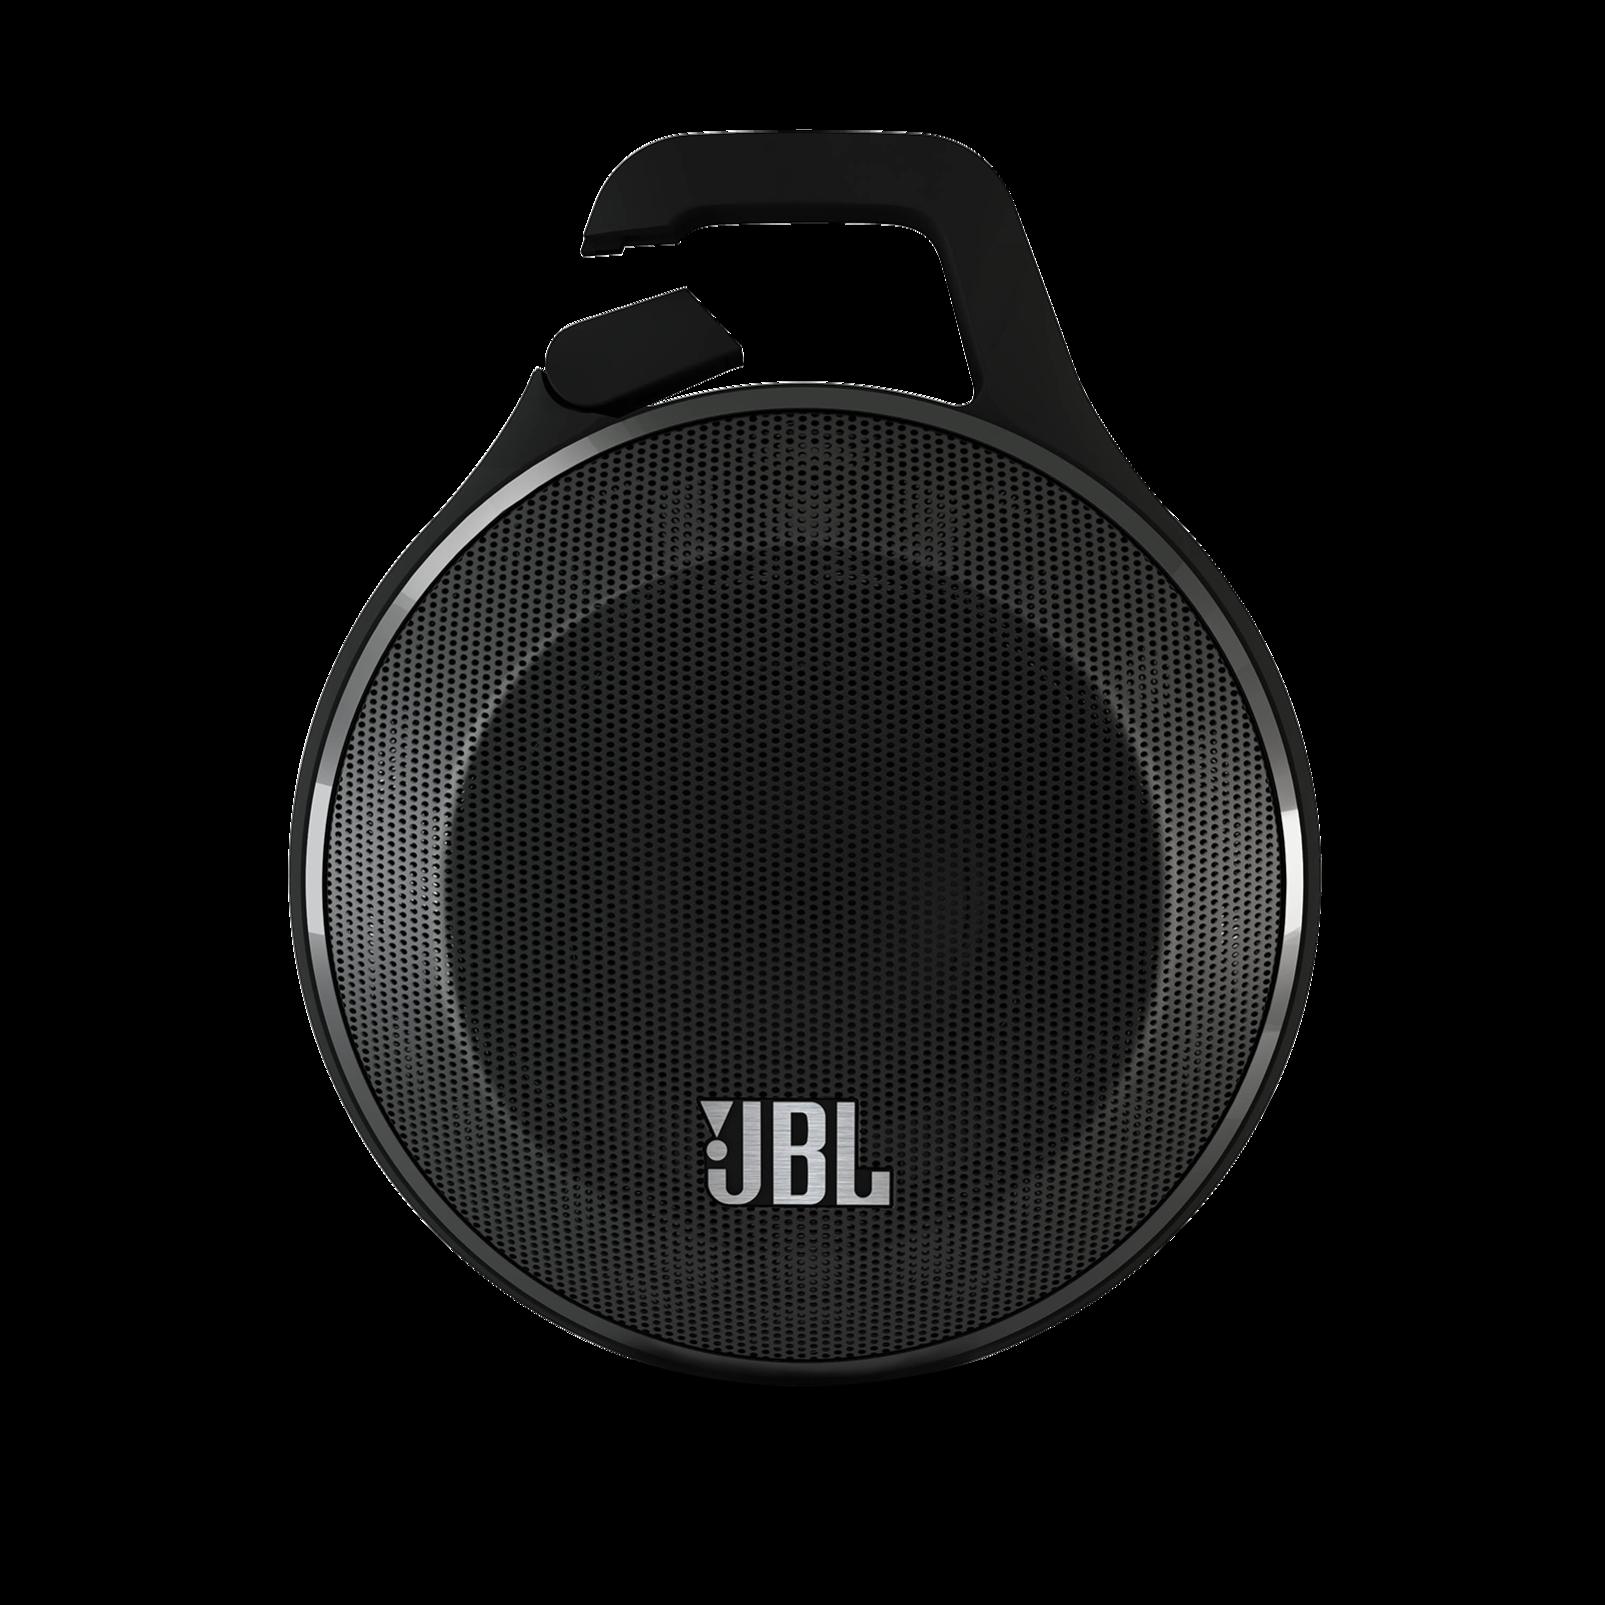 jbl clip ultra portable rechargeable speaker with integrated carabiner. Black Bedroom Furniture Sets. Home Design Ideas